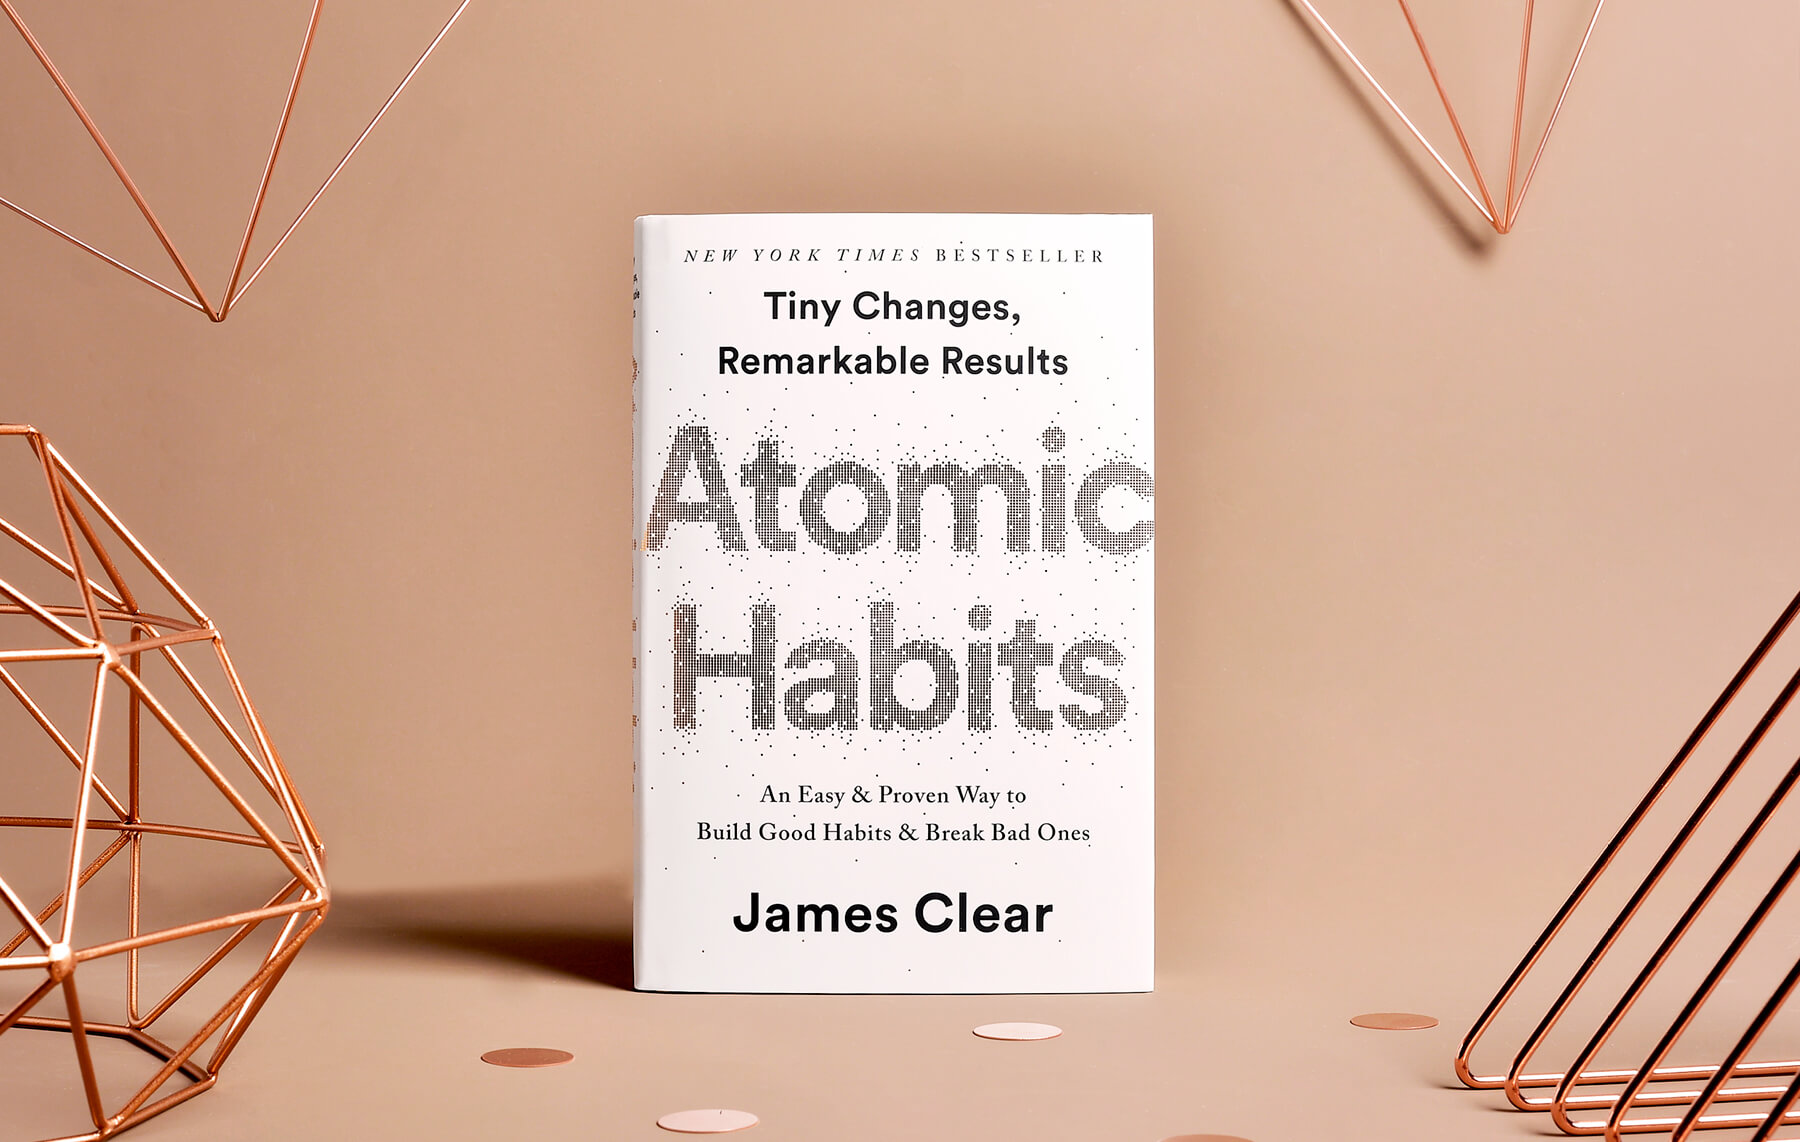 https://jamesclear.com/wp-content/uploads/2019/02/atomic-habits_gallery_hi-res_04.jpg